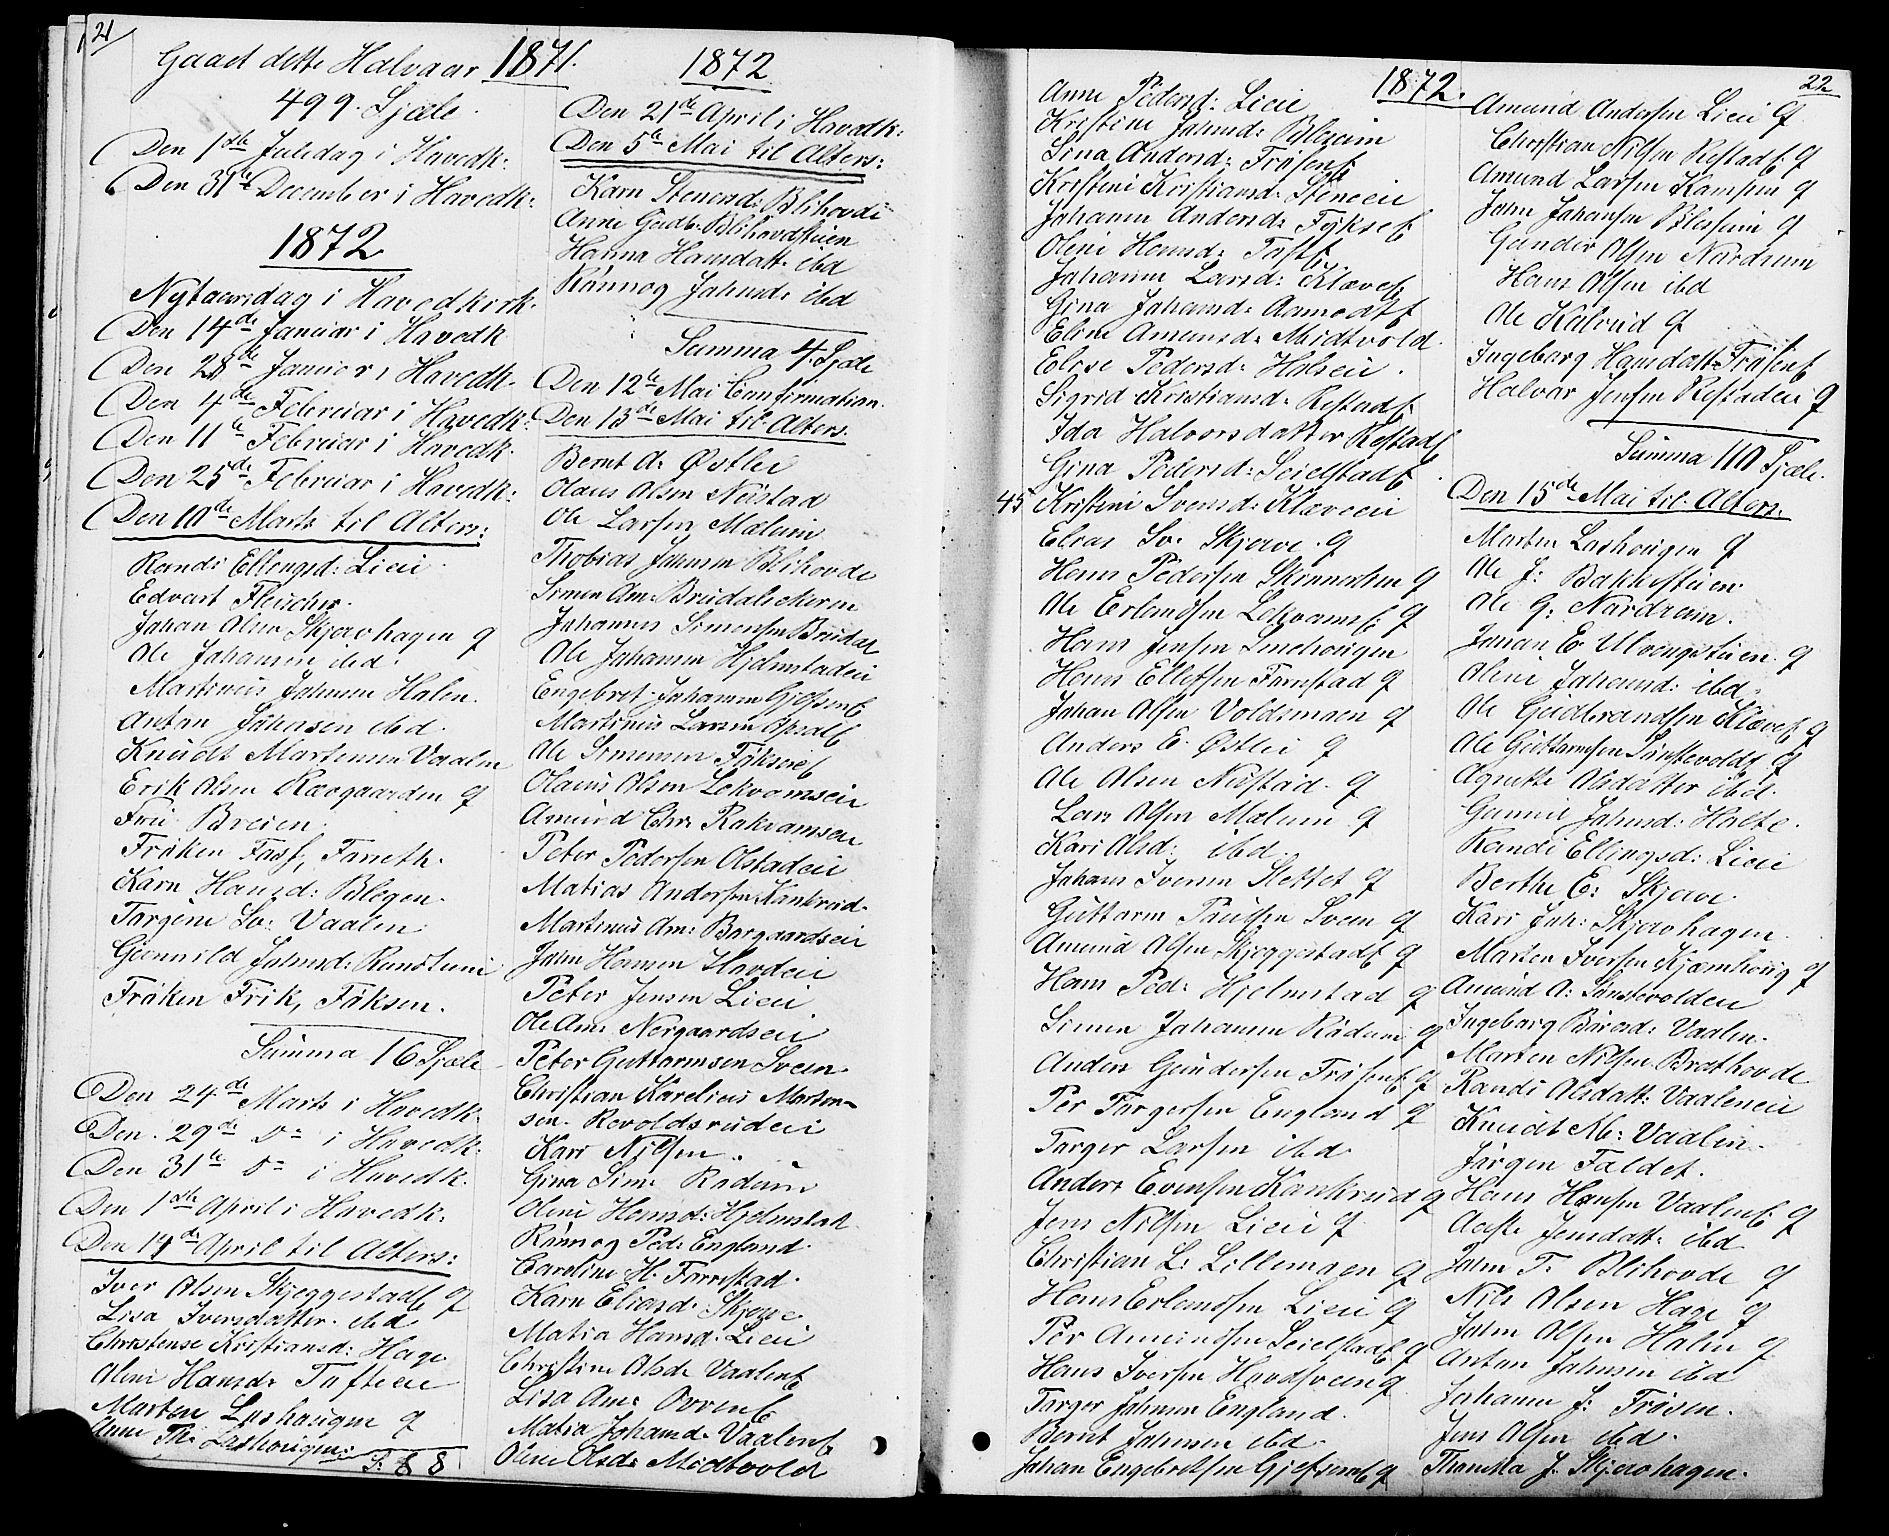 SAH, Østre Gausdal prestekontor, Klokkerbok nr. 1, 1863-1893, s. 21-22